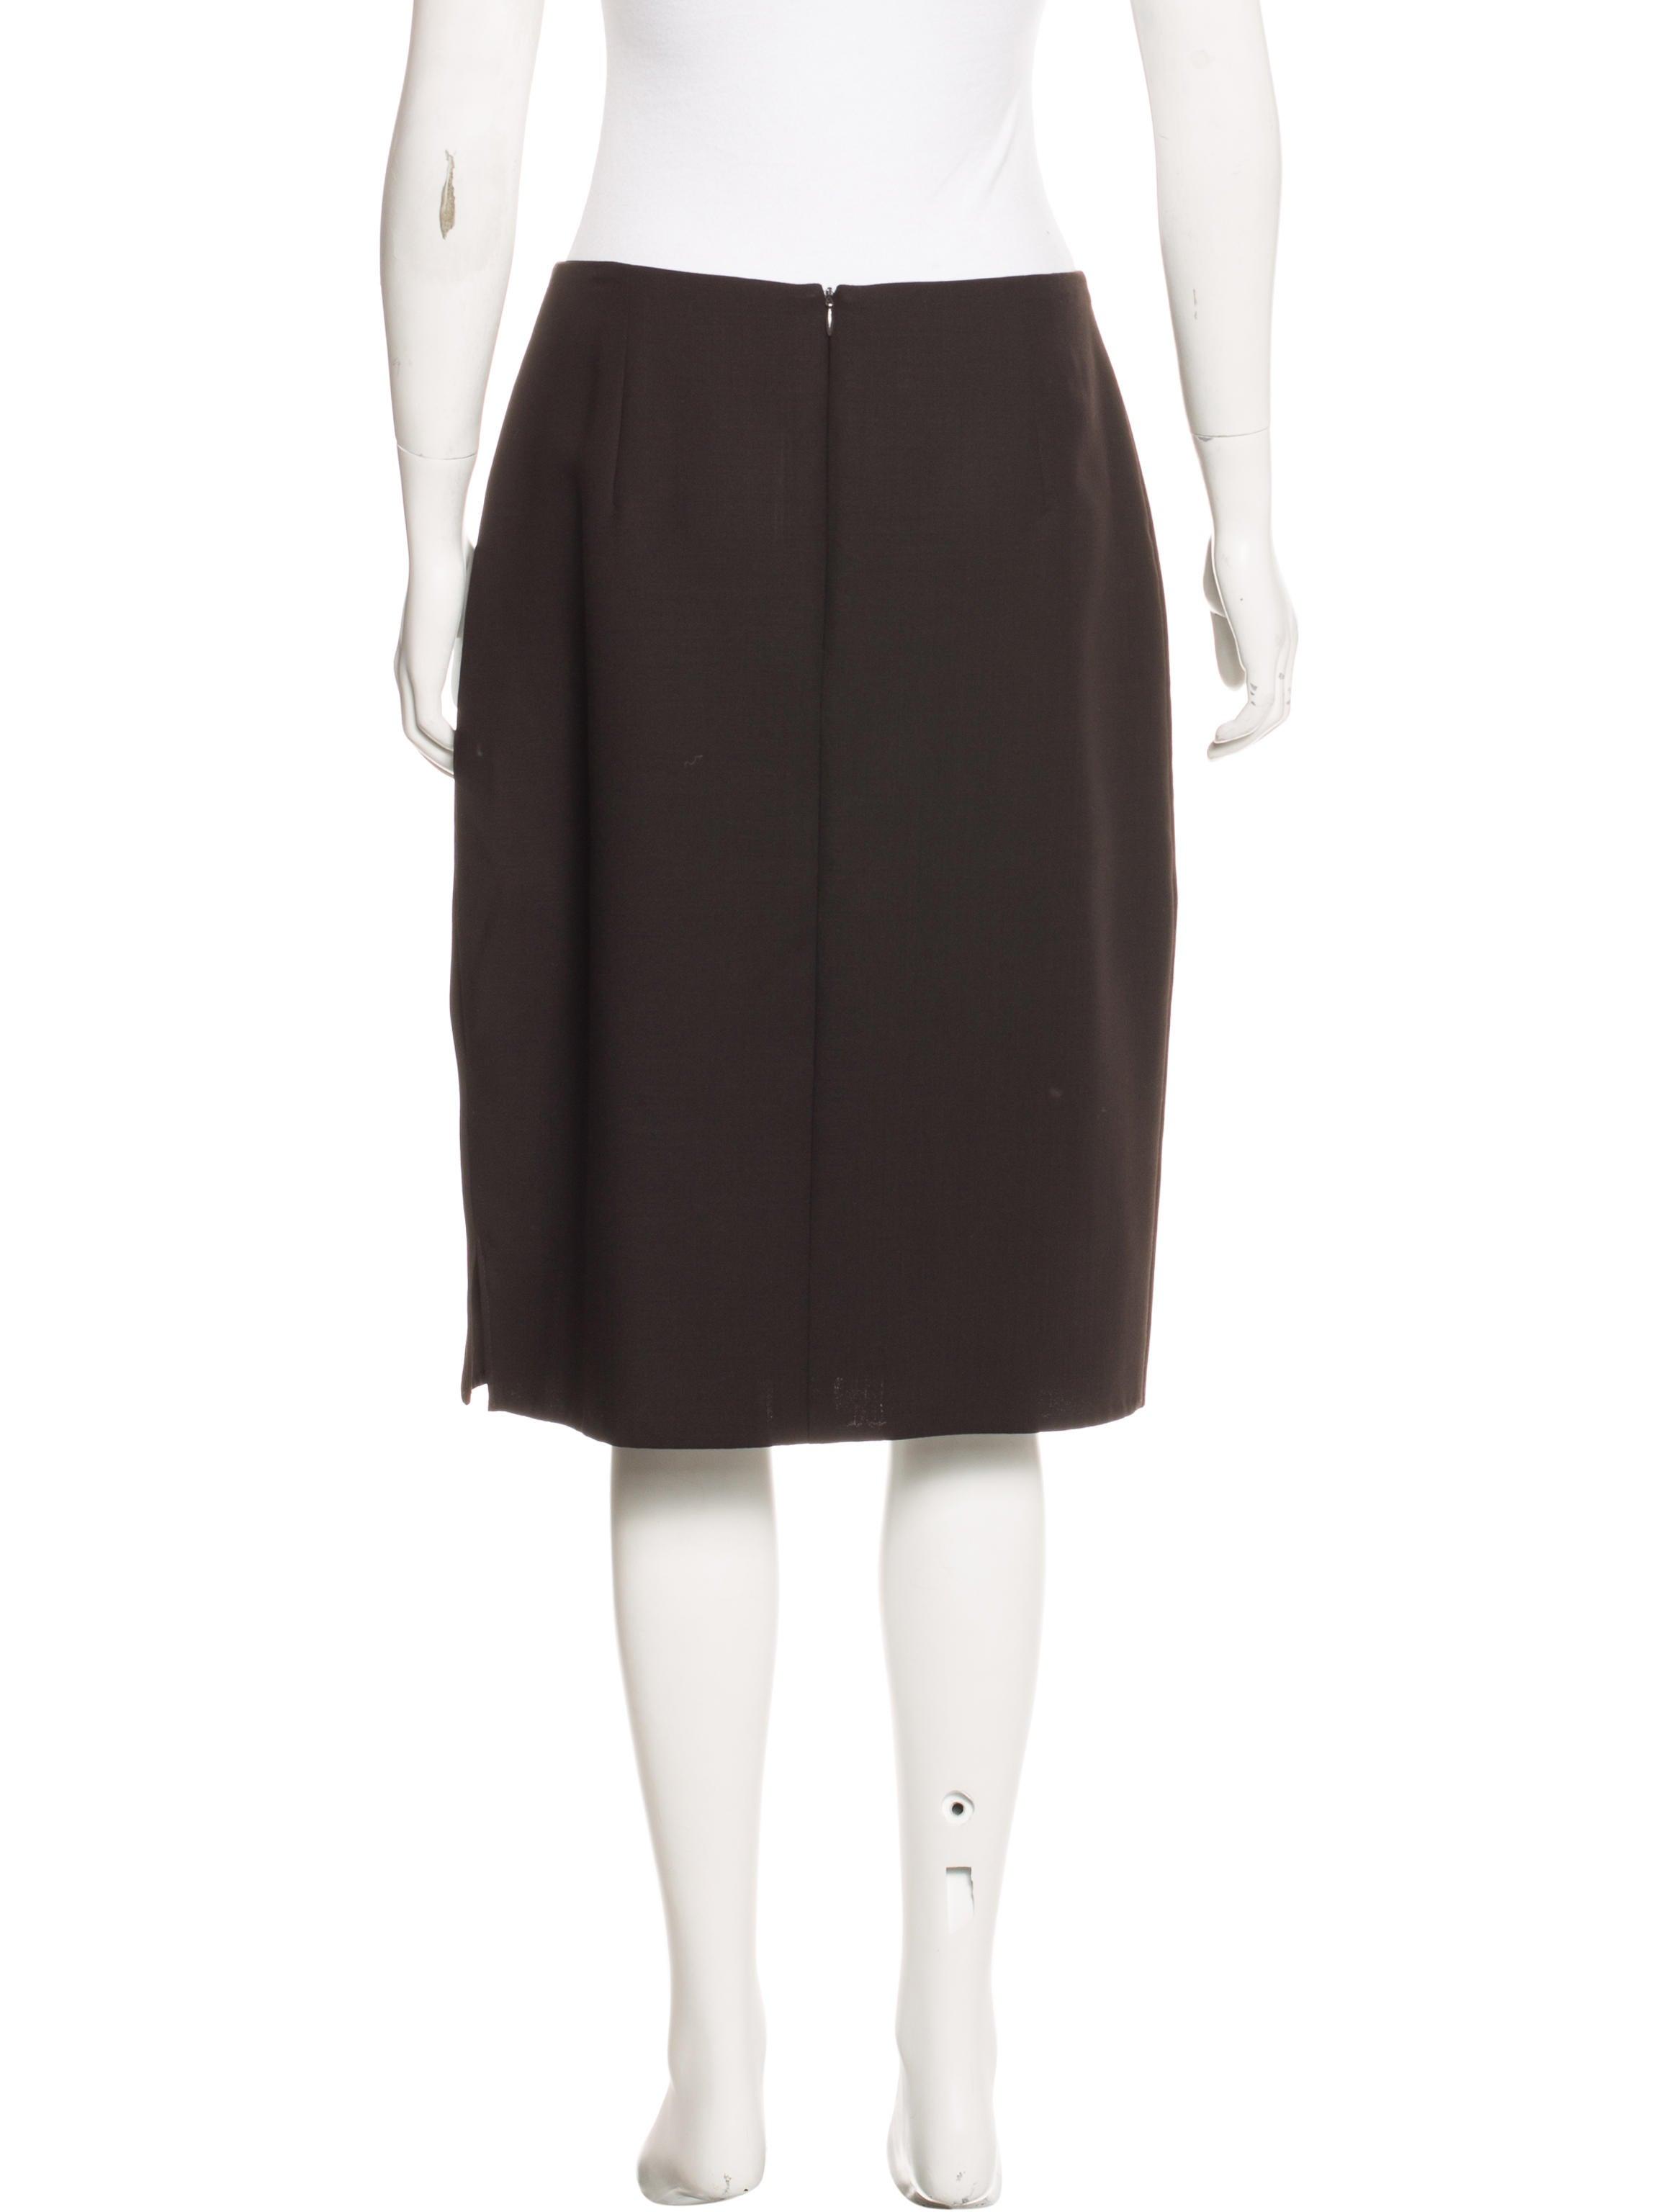 Akris Knee-Length Pencil Skirt - Clothing